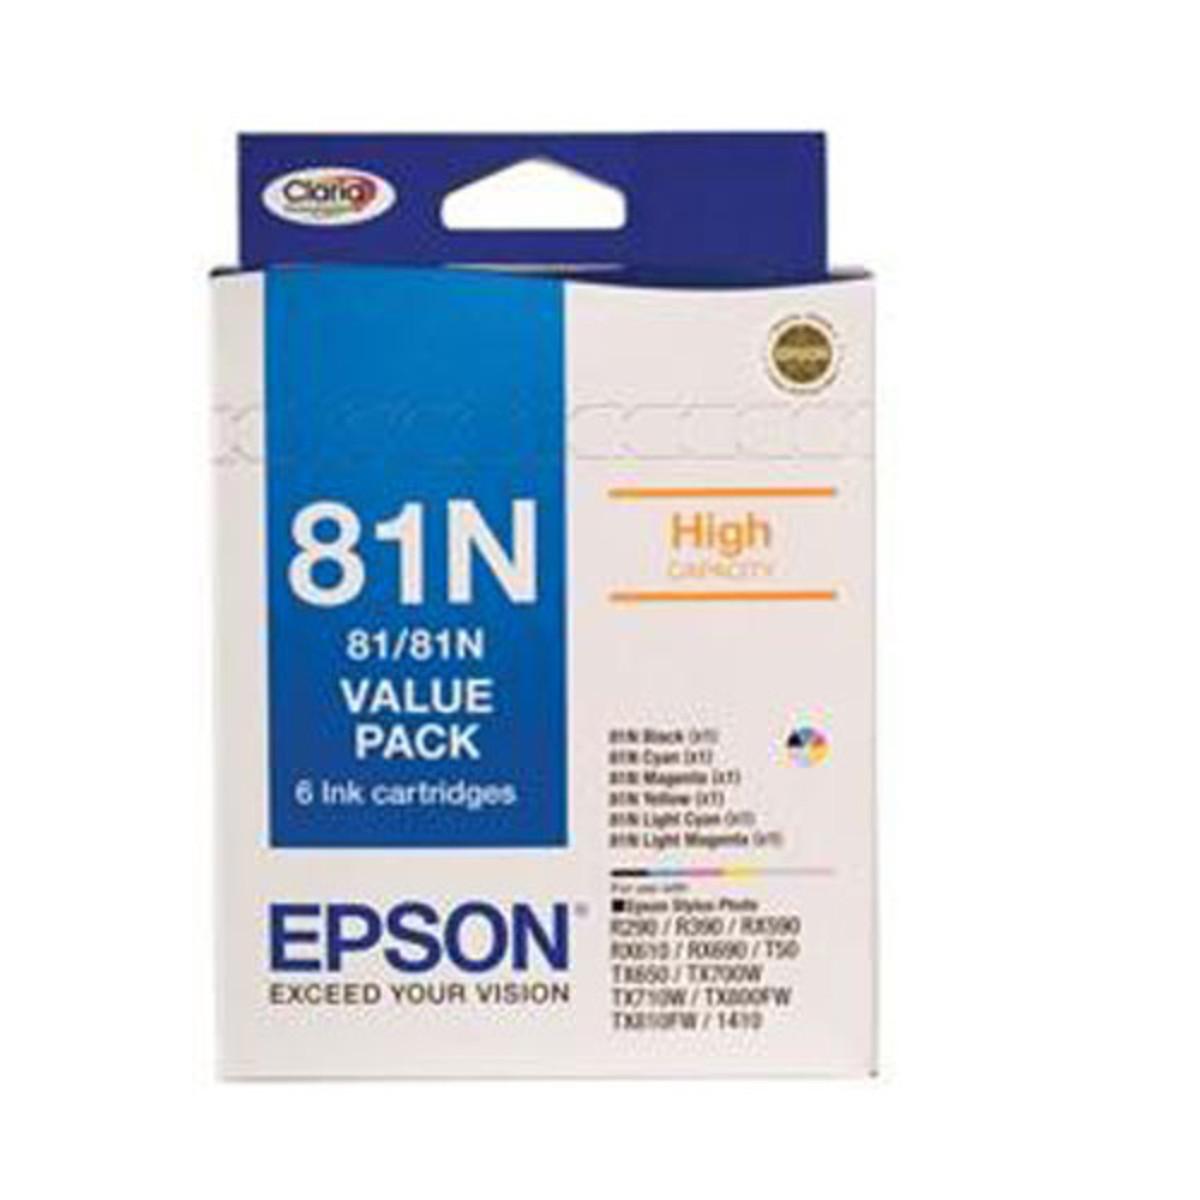 Epson 81N Colour Ink Cartridges - Bundle Pack